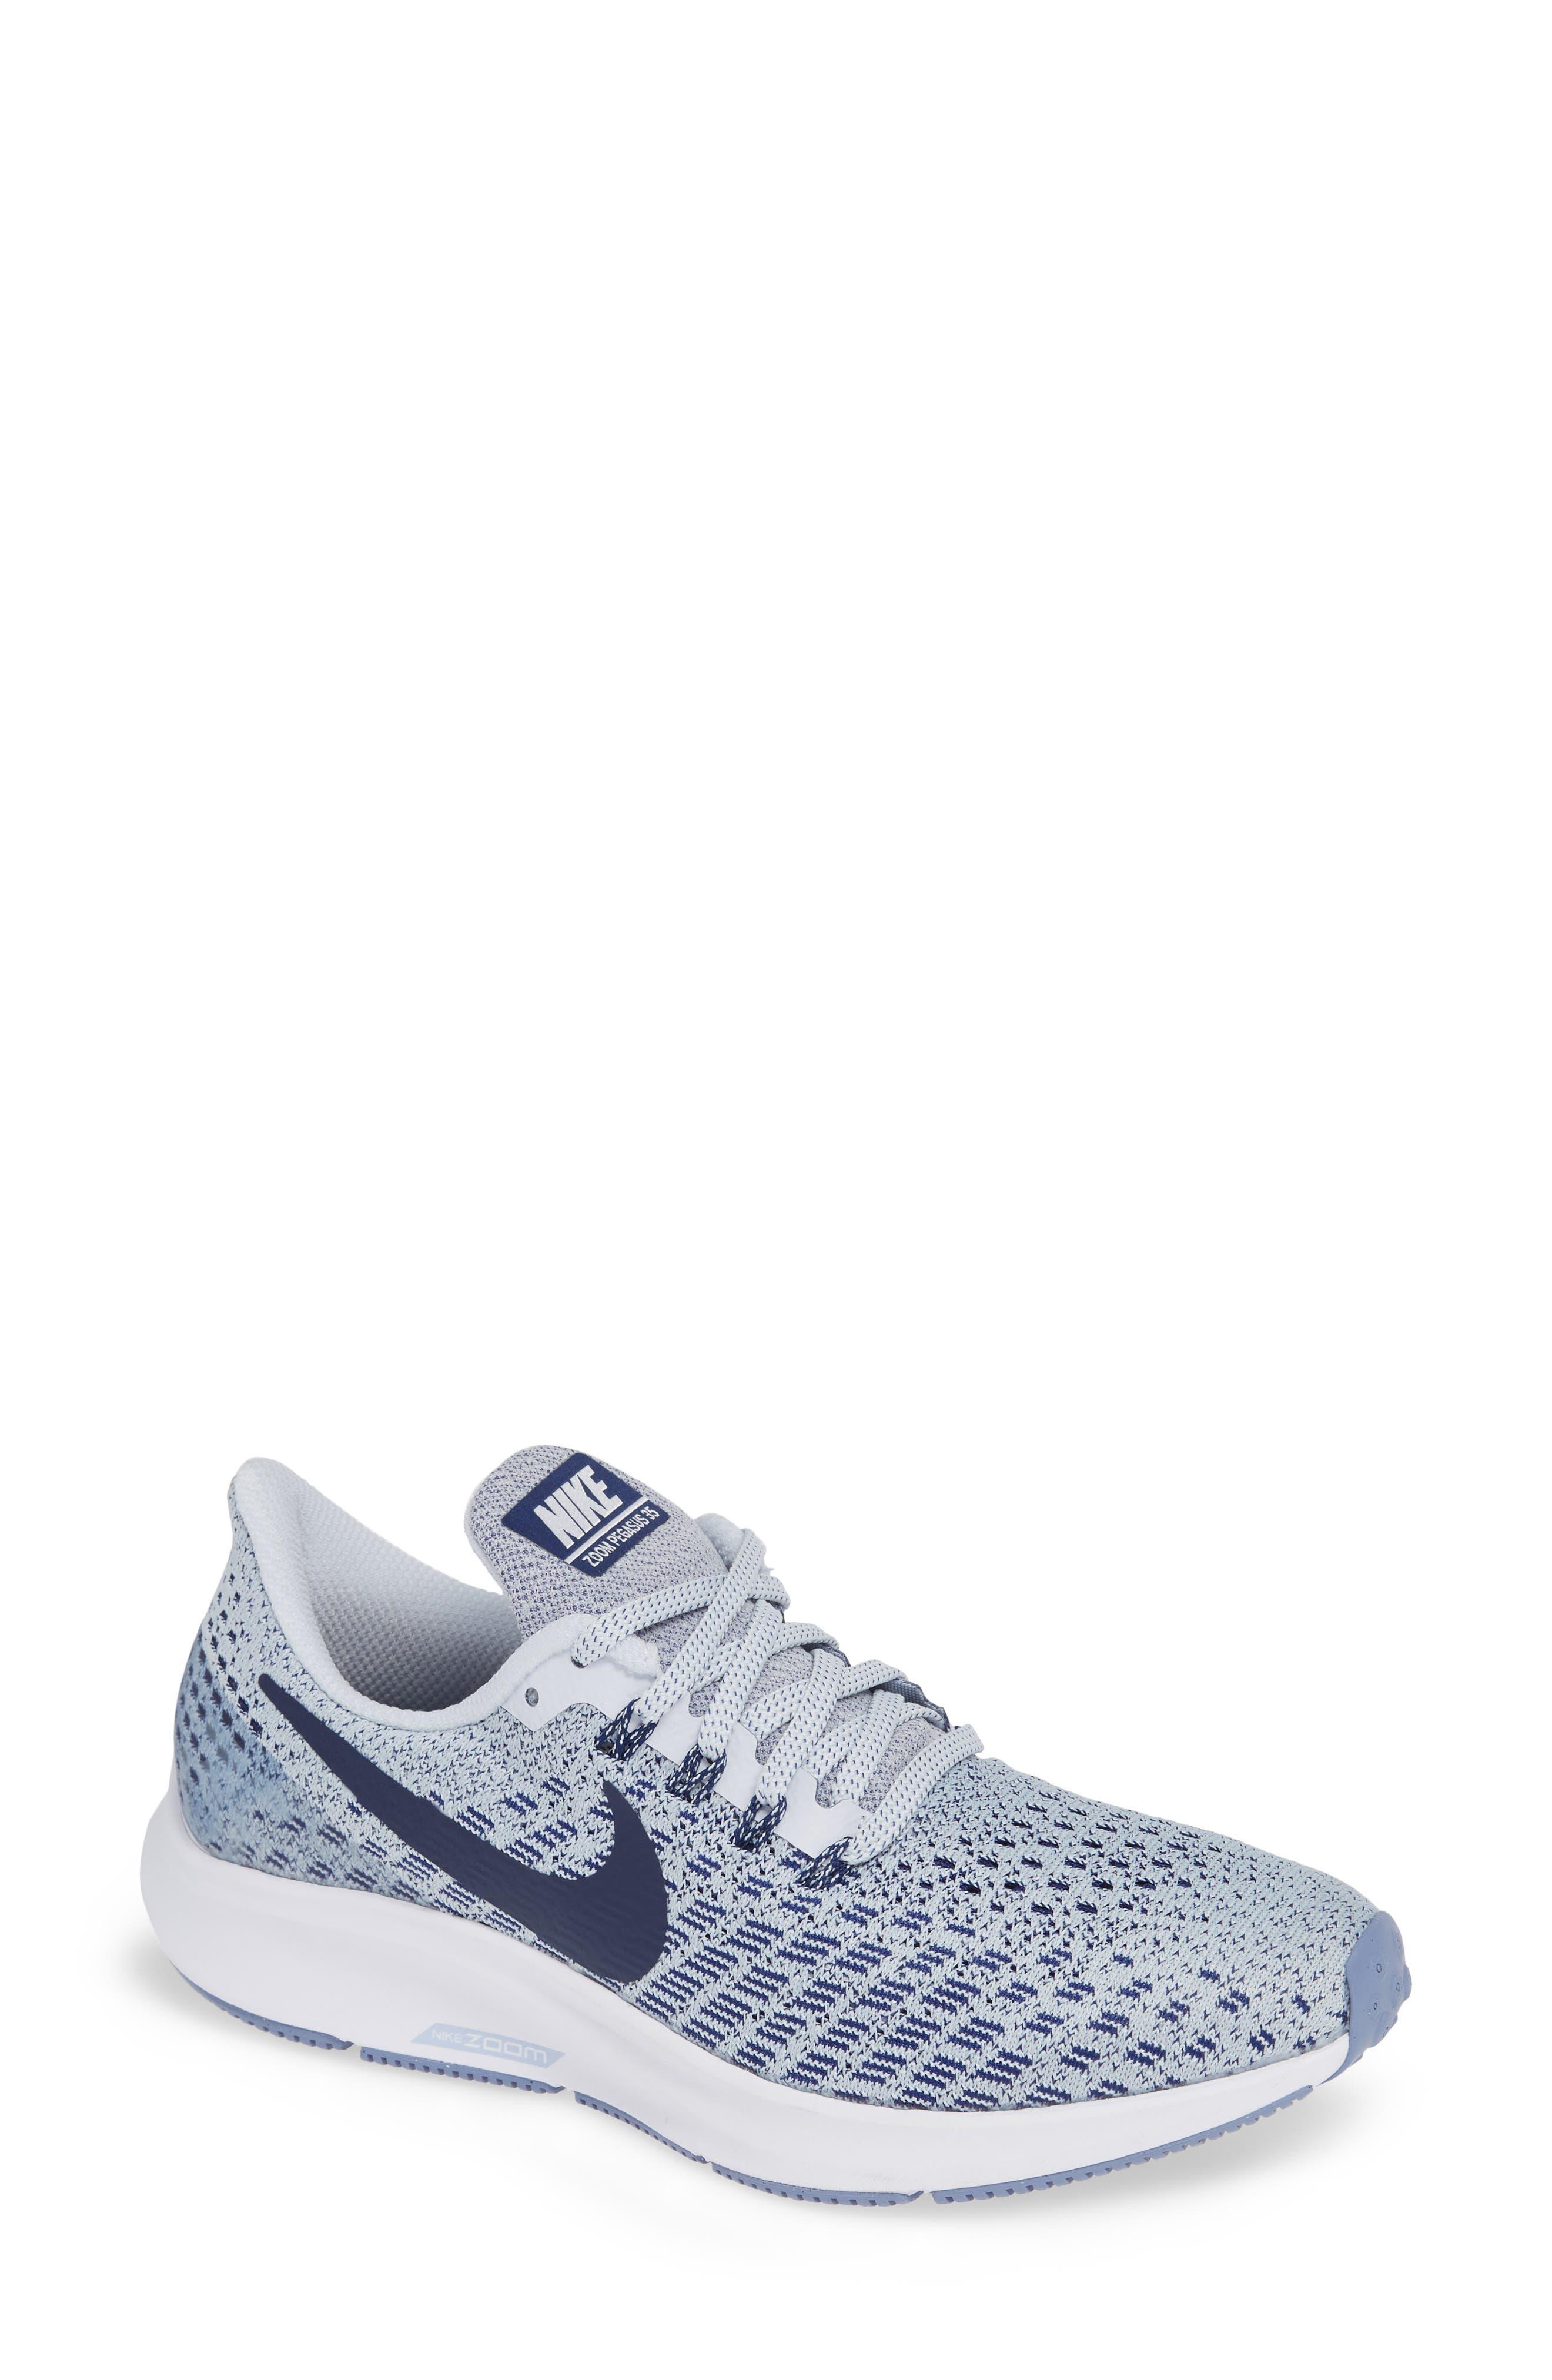 Air Zoom Pegasus 35 Running Shoe,                             Main thumbnail 1, color,                             GREY/ BLUE/ WHITE/ ALUMINUM